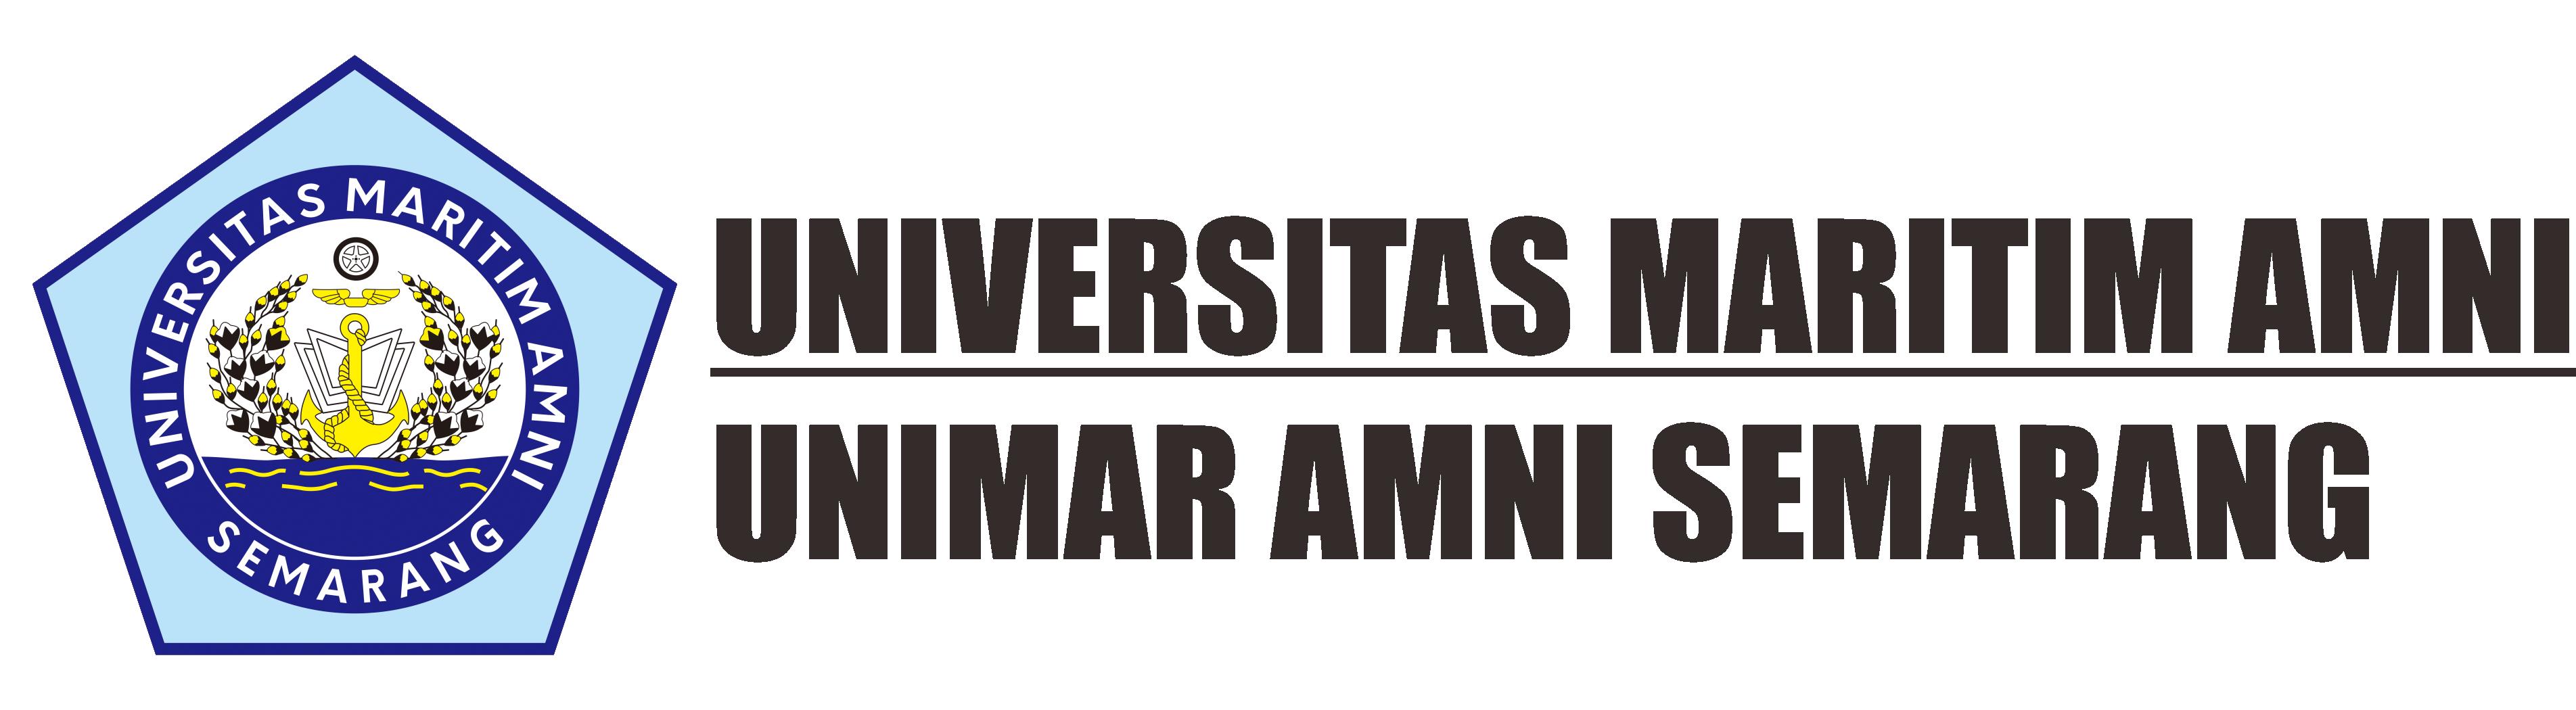 Universitas Maritim AMNI Semarang